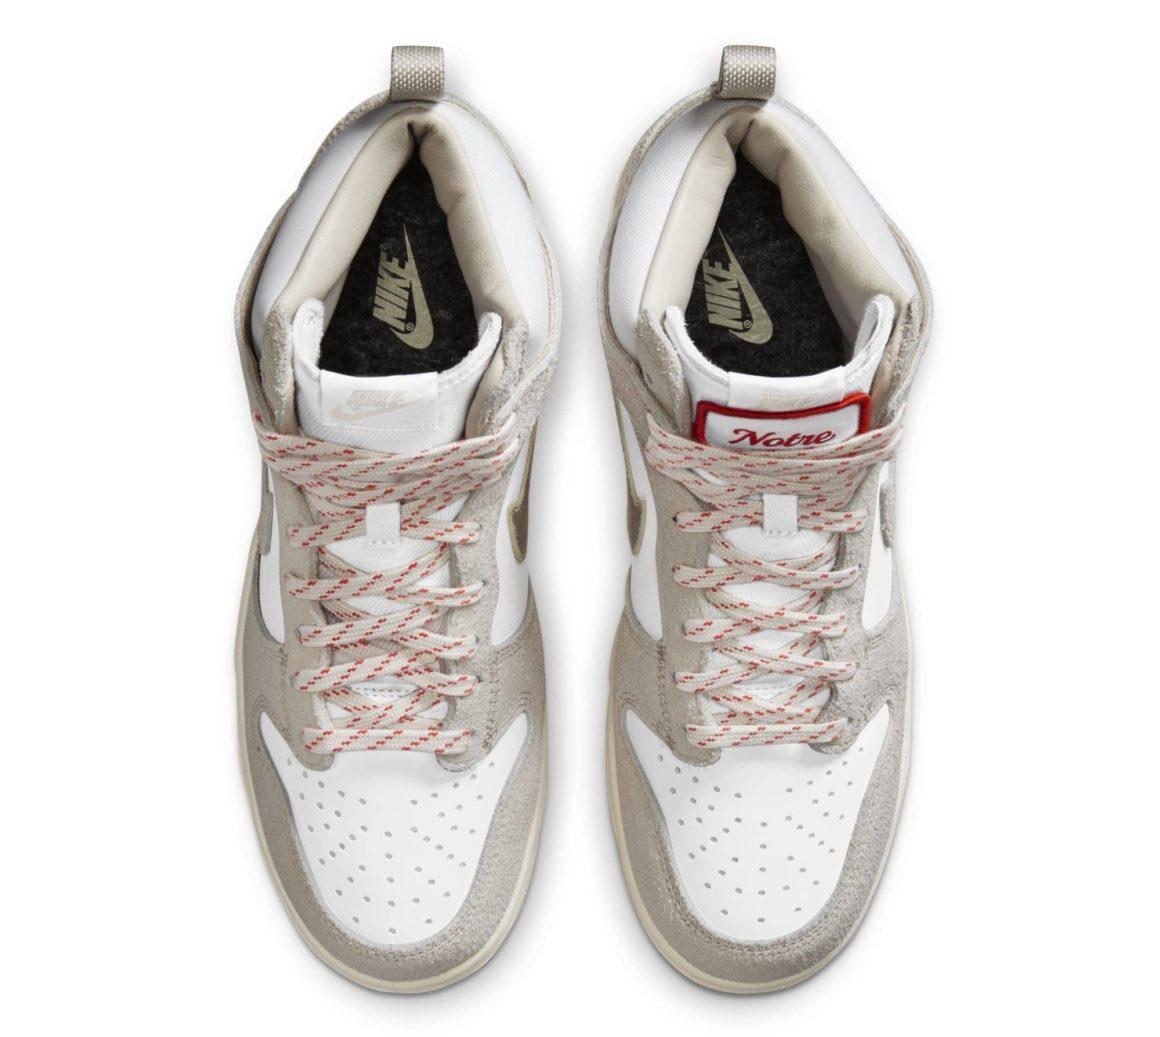 Notre x Nike Dunk High cw3092-100